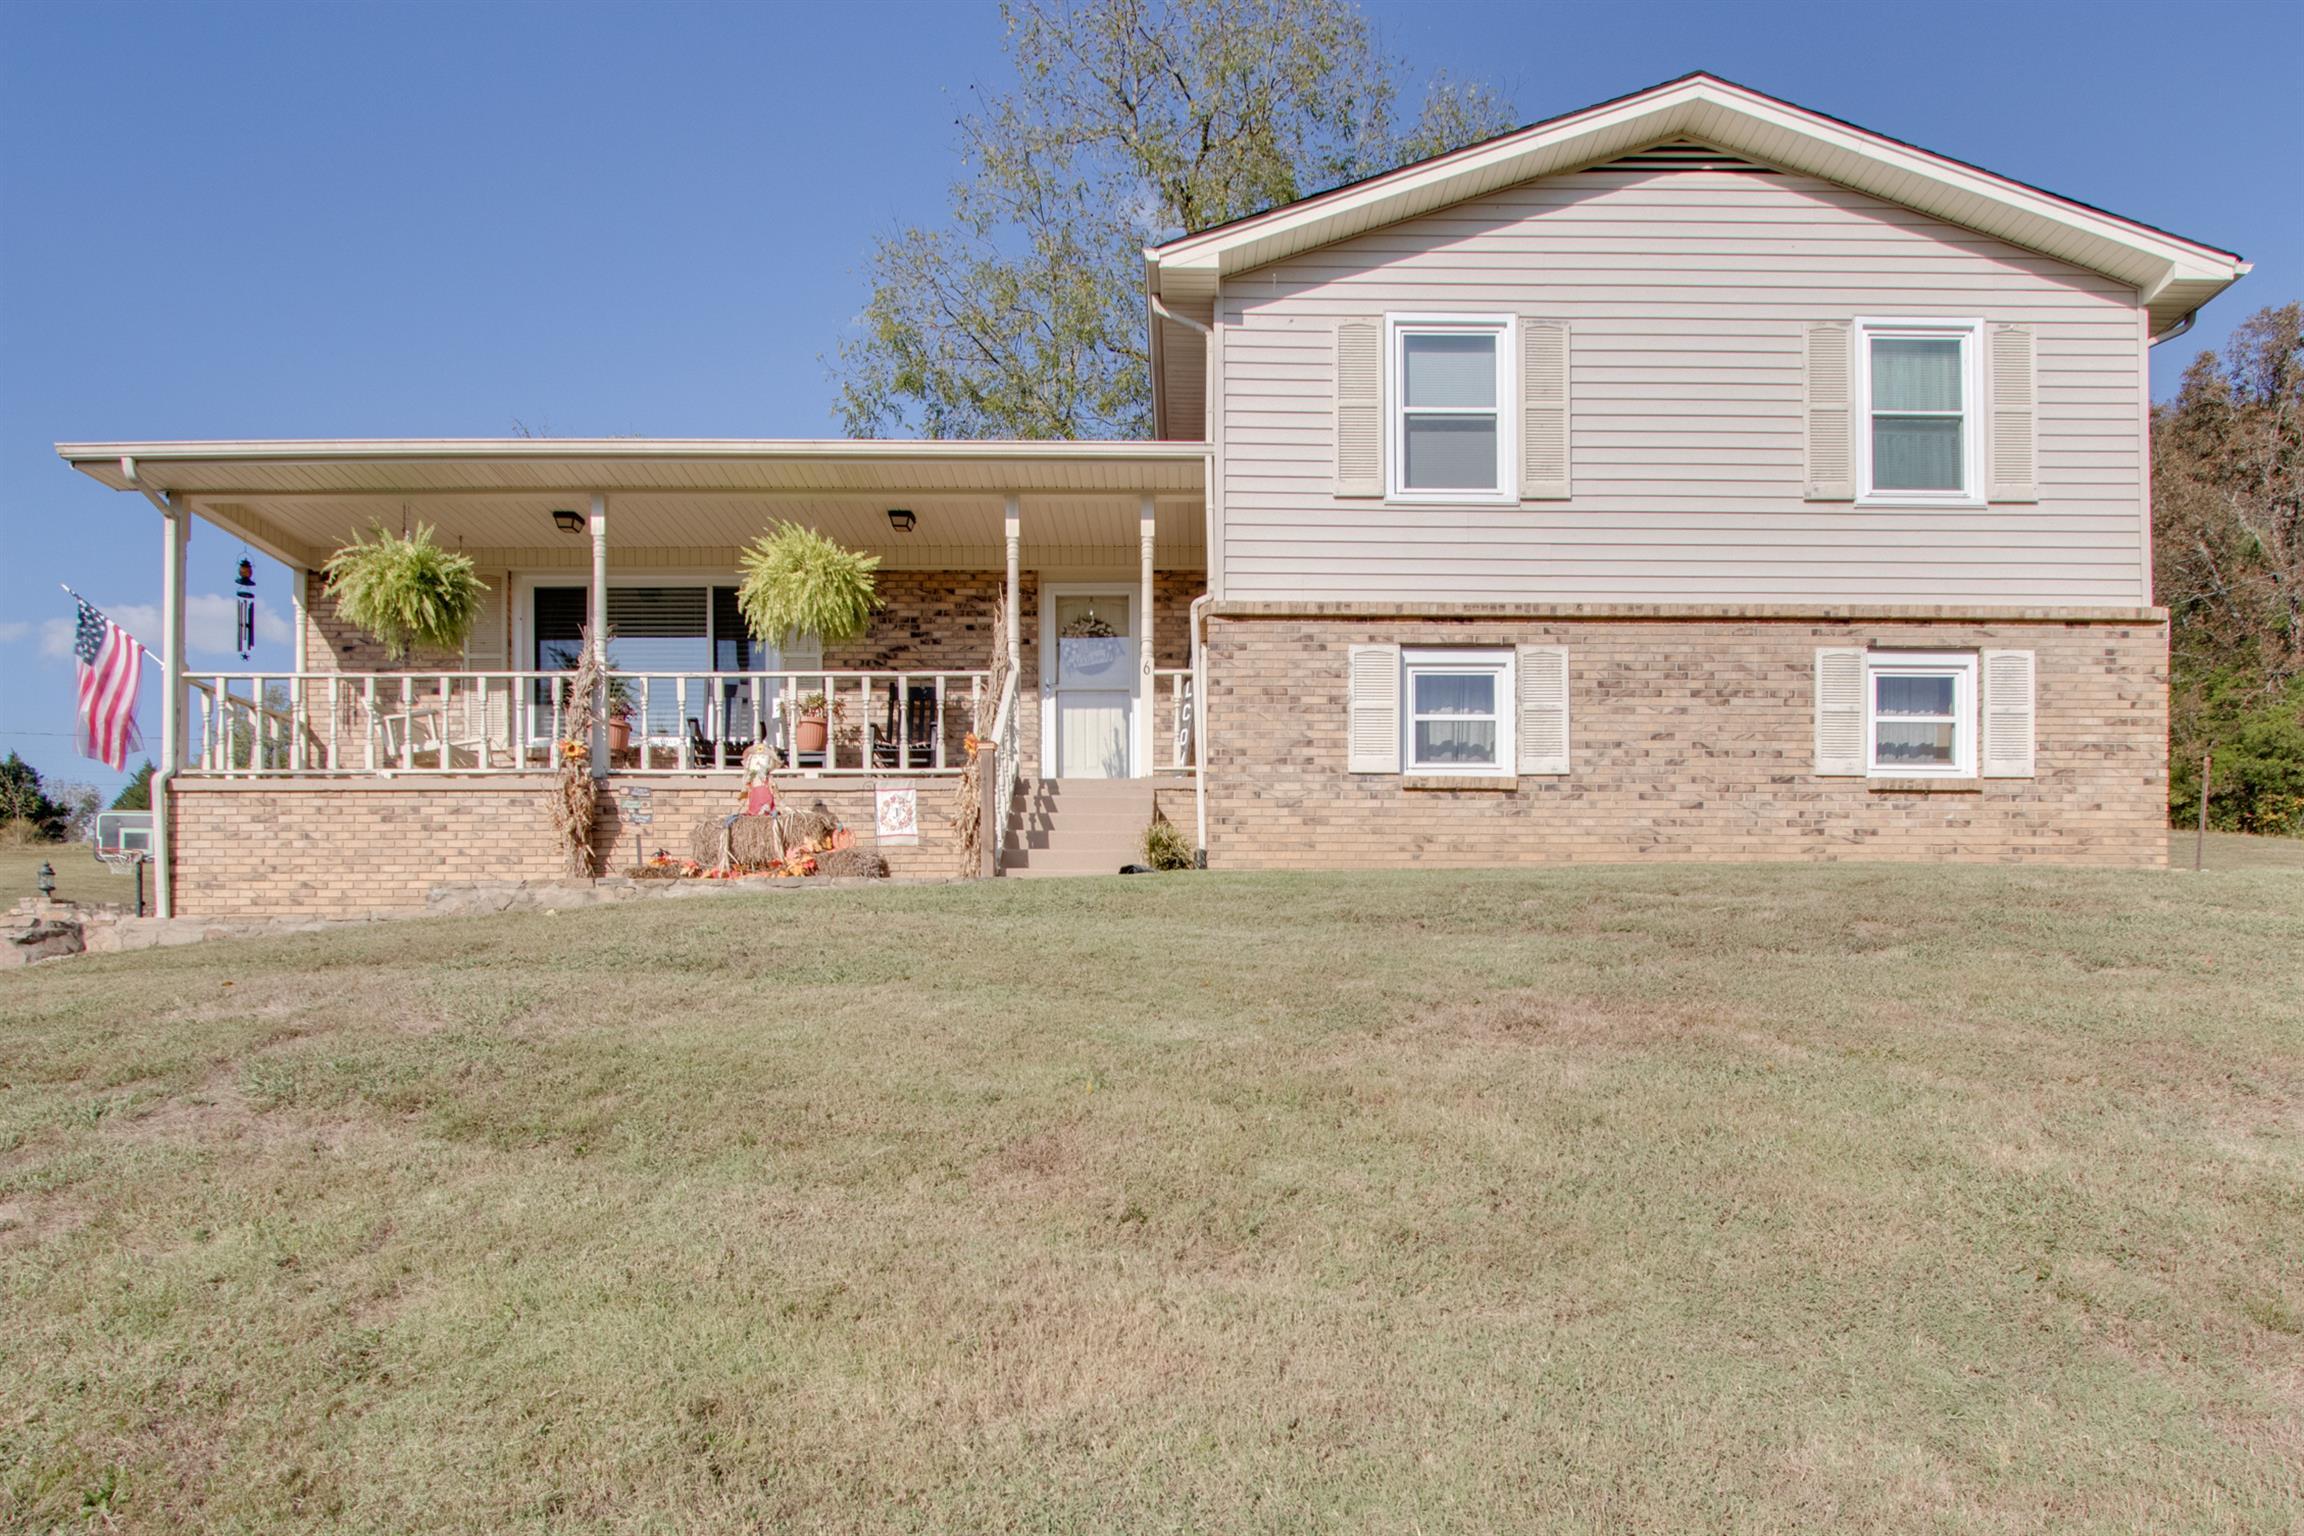 6 Joshua Ln, Pleasant Shade, TN 37145 - Pleasant Shade, TN real estate listing